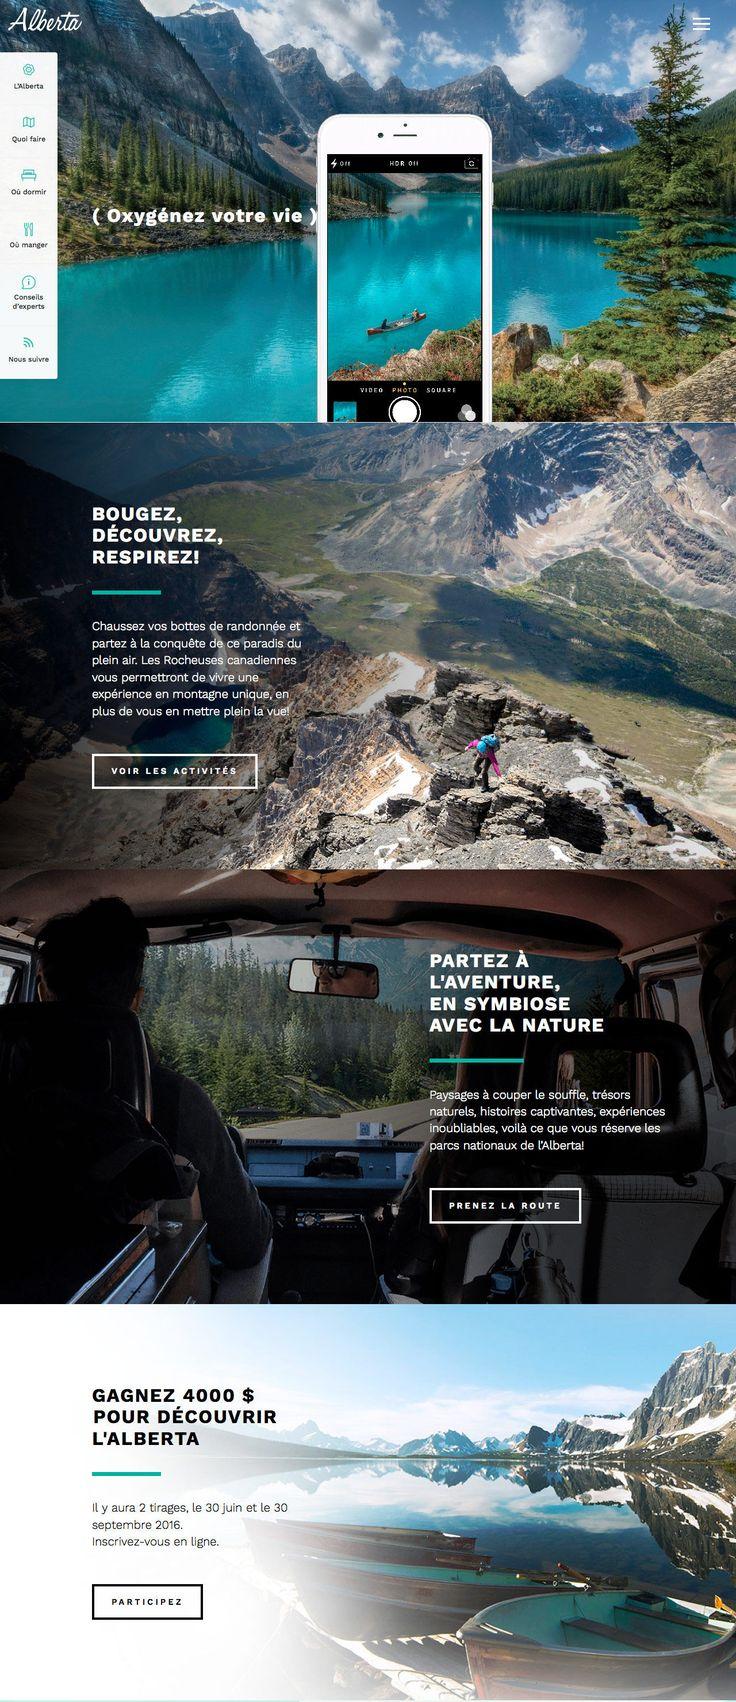 Tourisme Alberta (More web design inspiration at topdesigninspiration.com)…